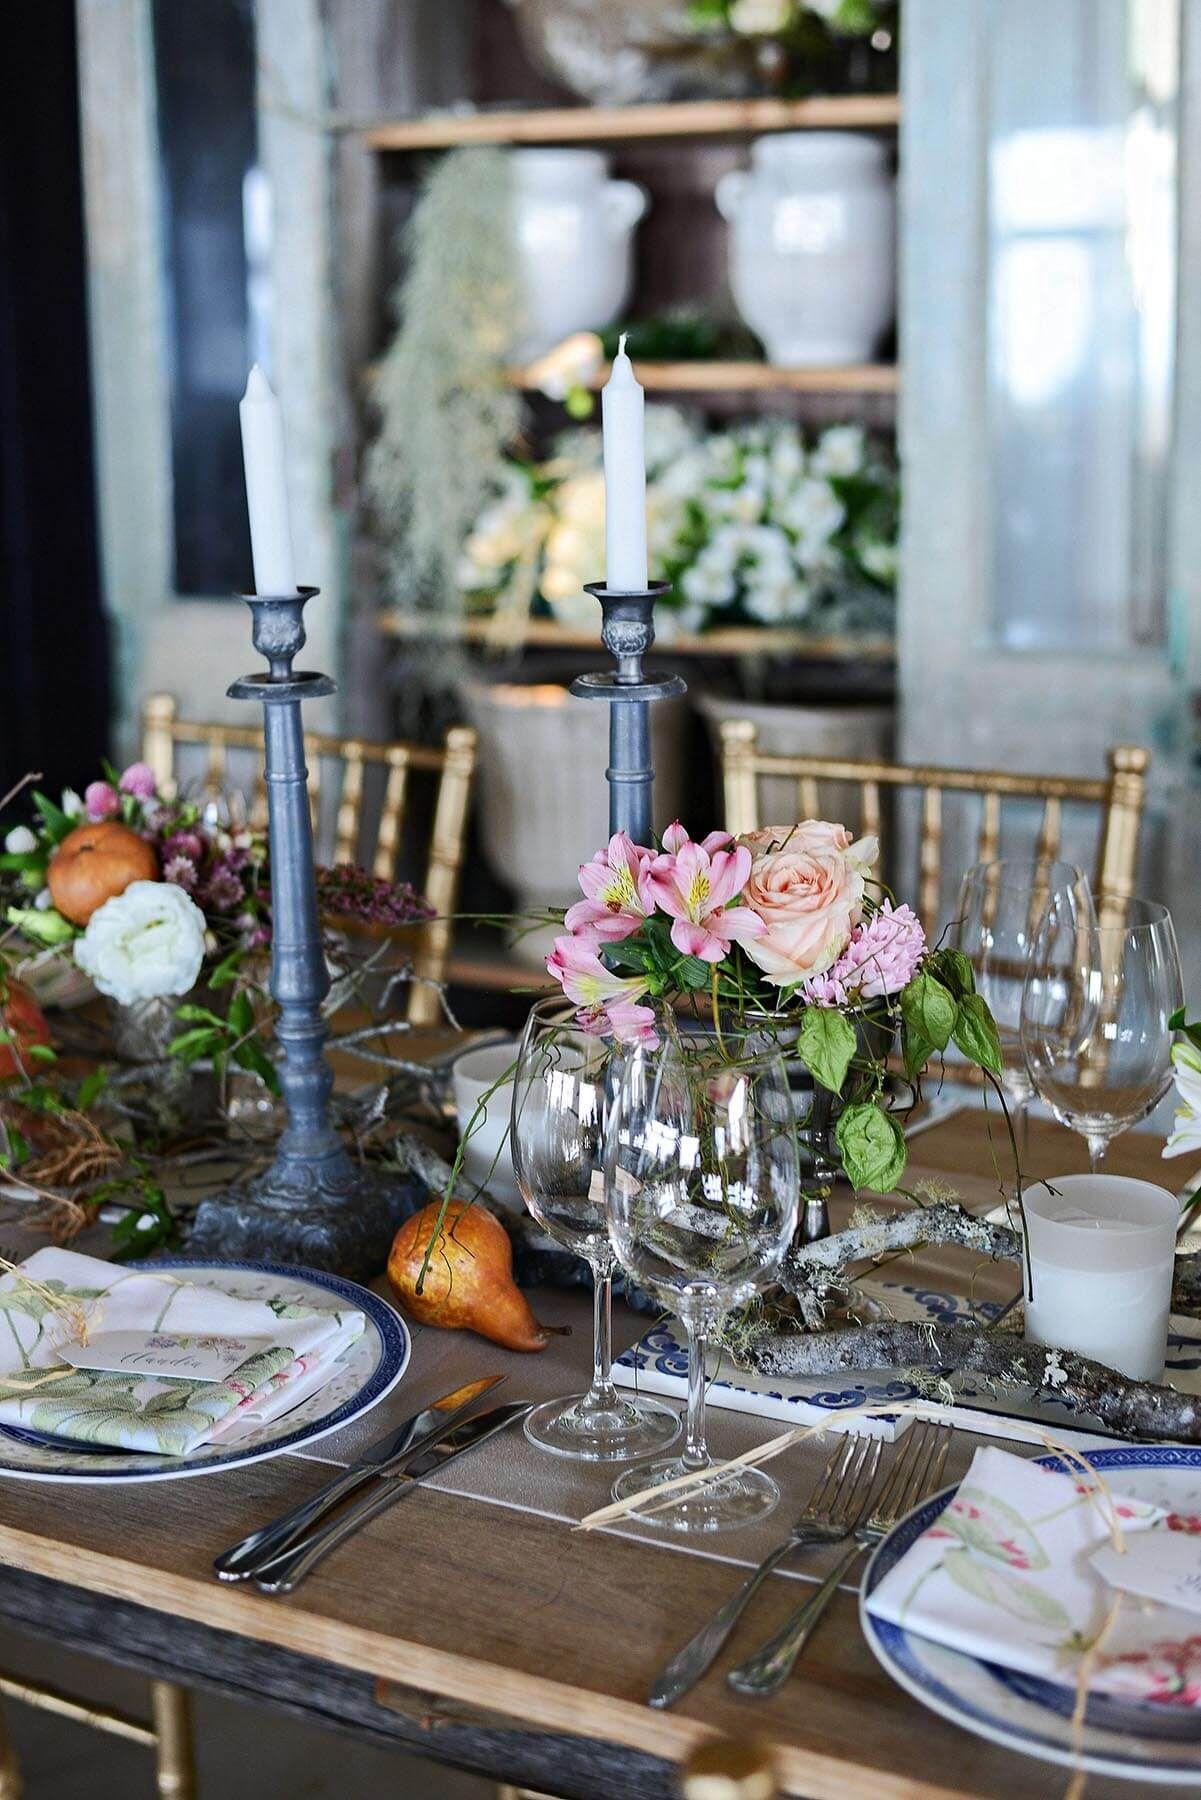 Barn wedding table settings  The Rose Barn  Otto de Jager Wedding  Tablesettings and weddings